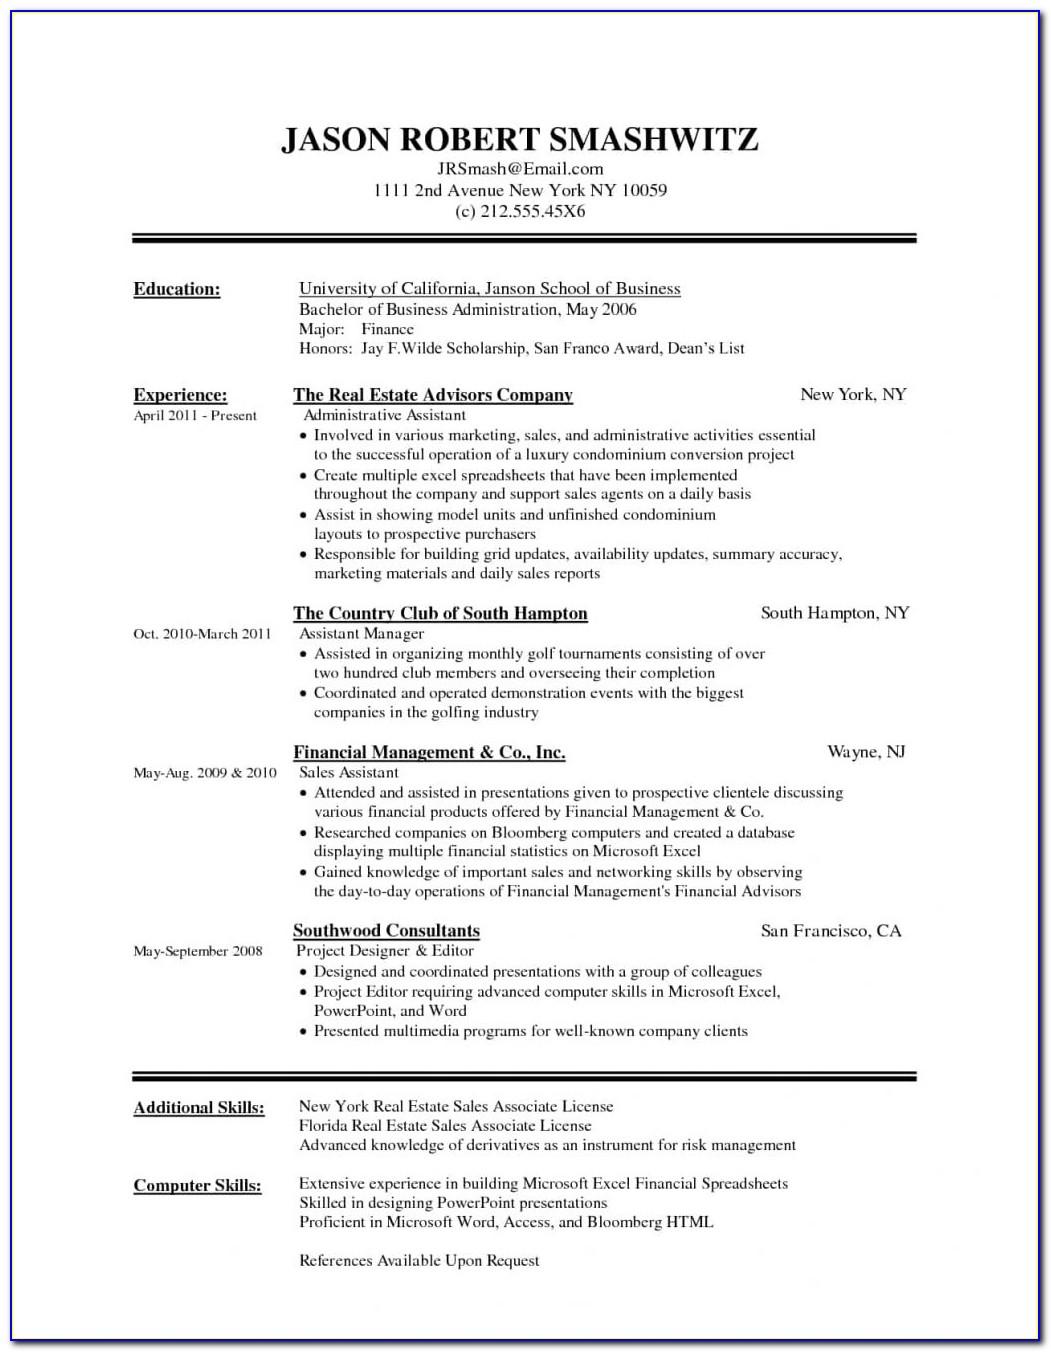 Free Functional Resume Template - Resume : Resume Examples ...